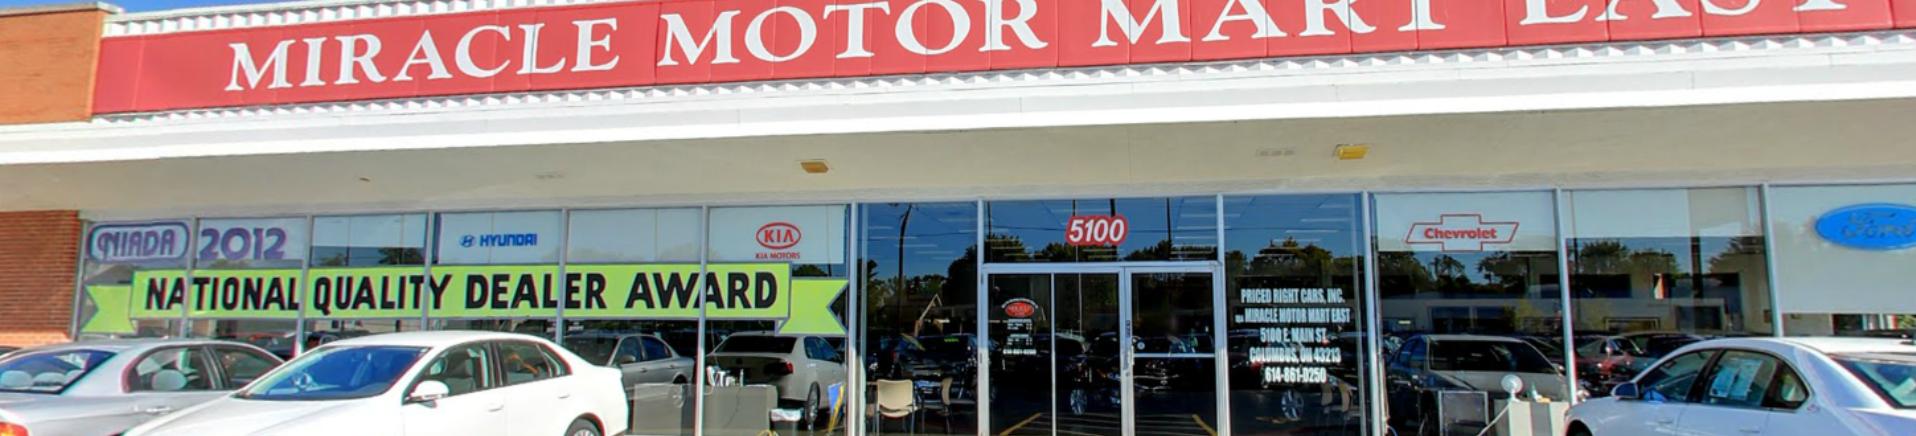 Miracle motor mart east main st